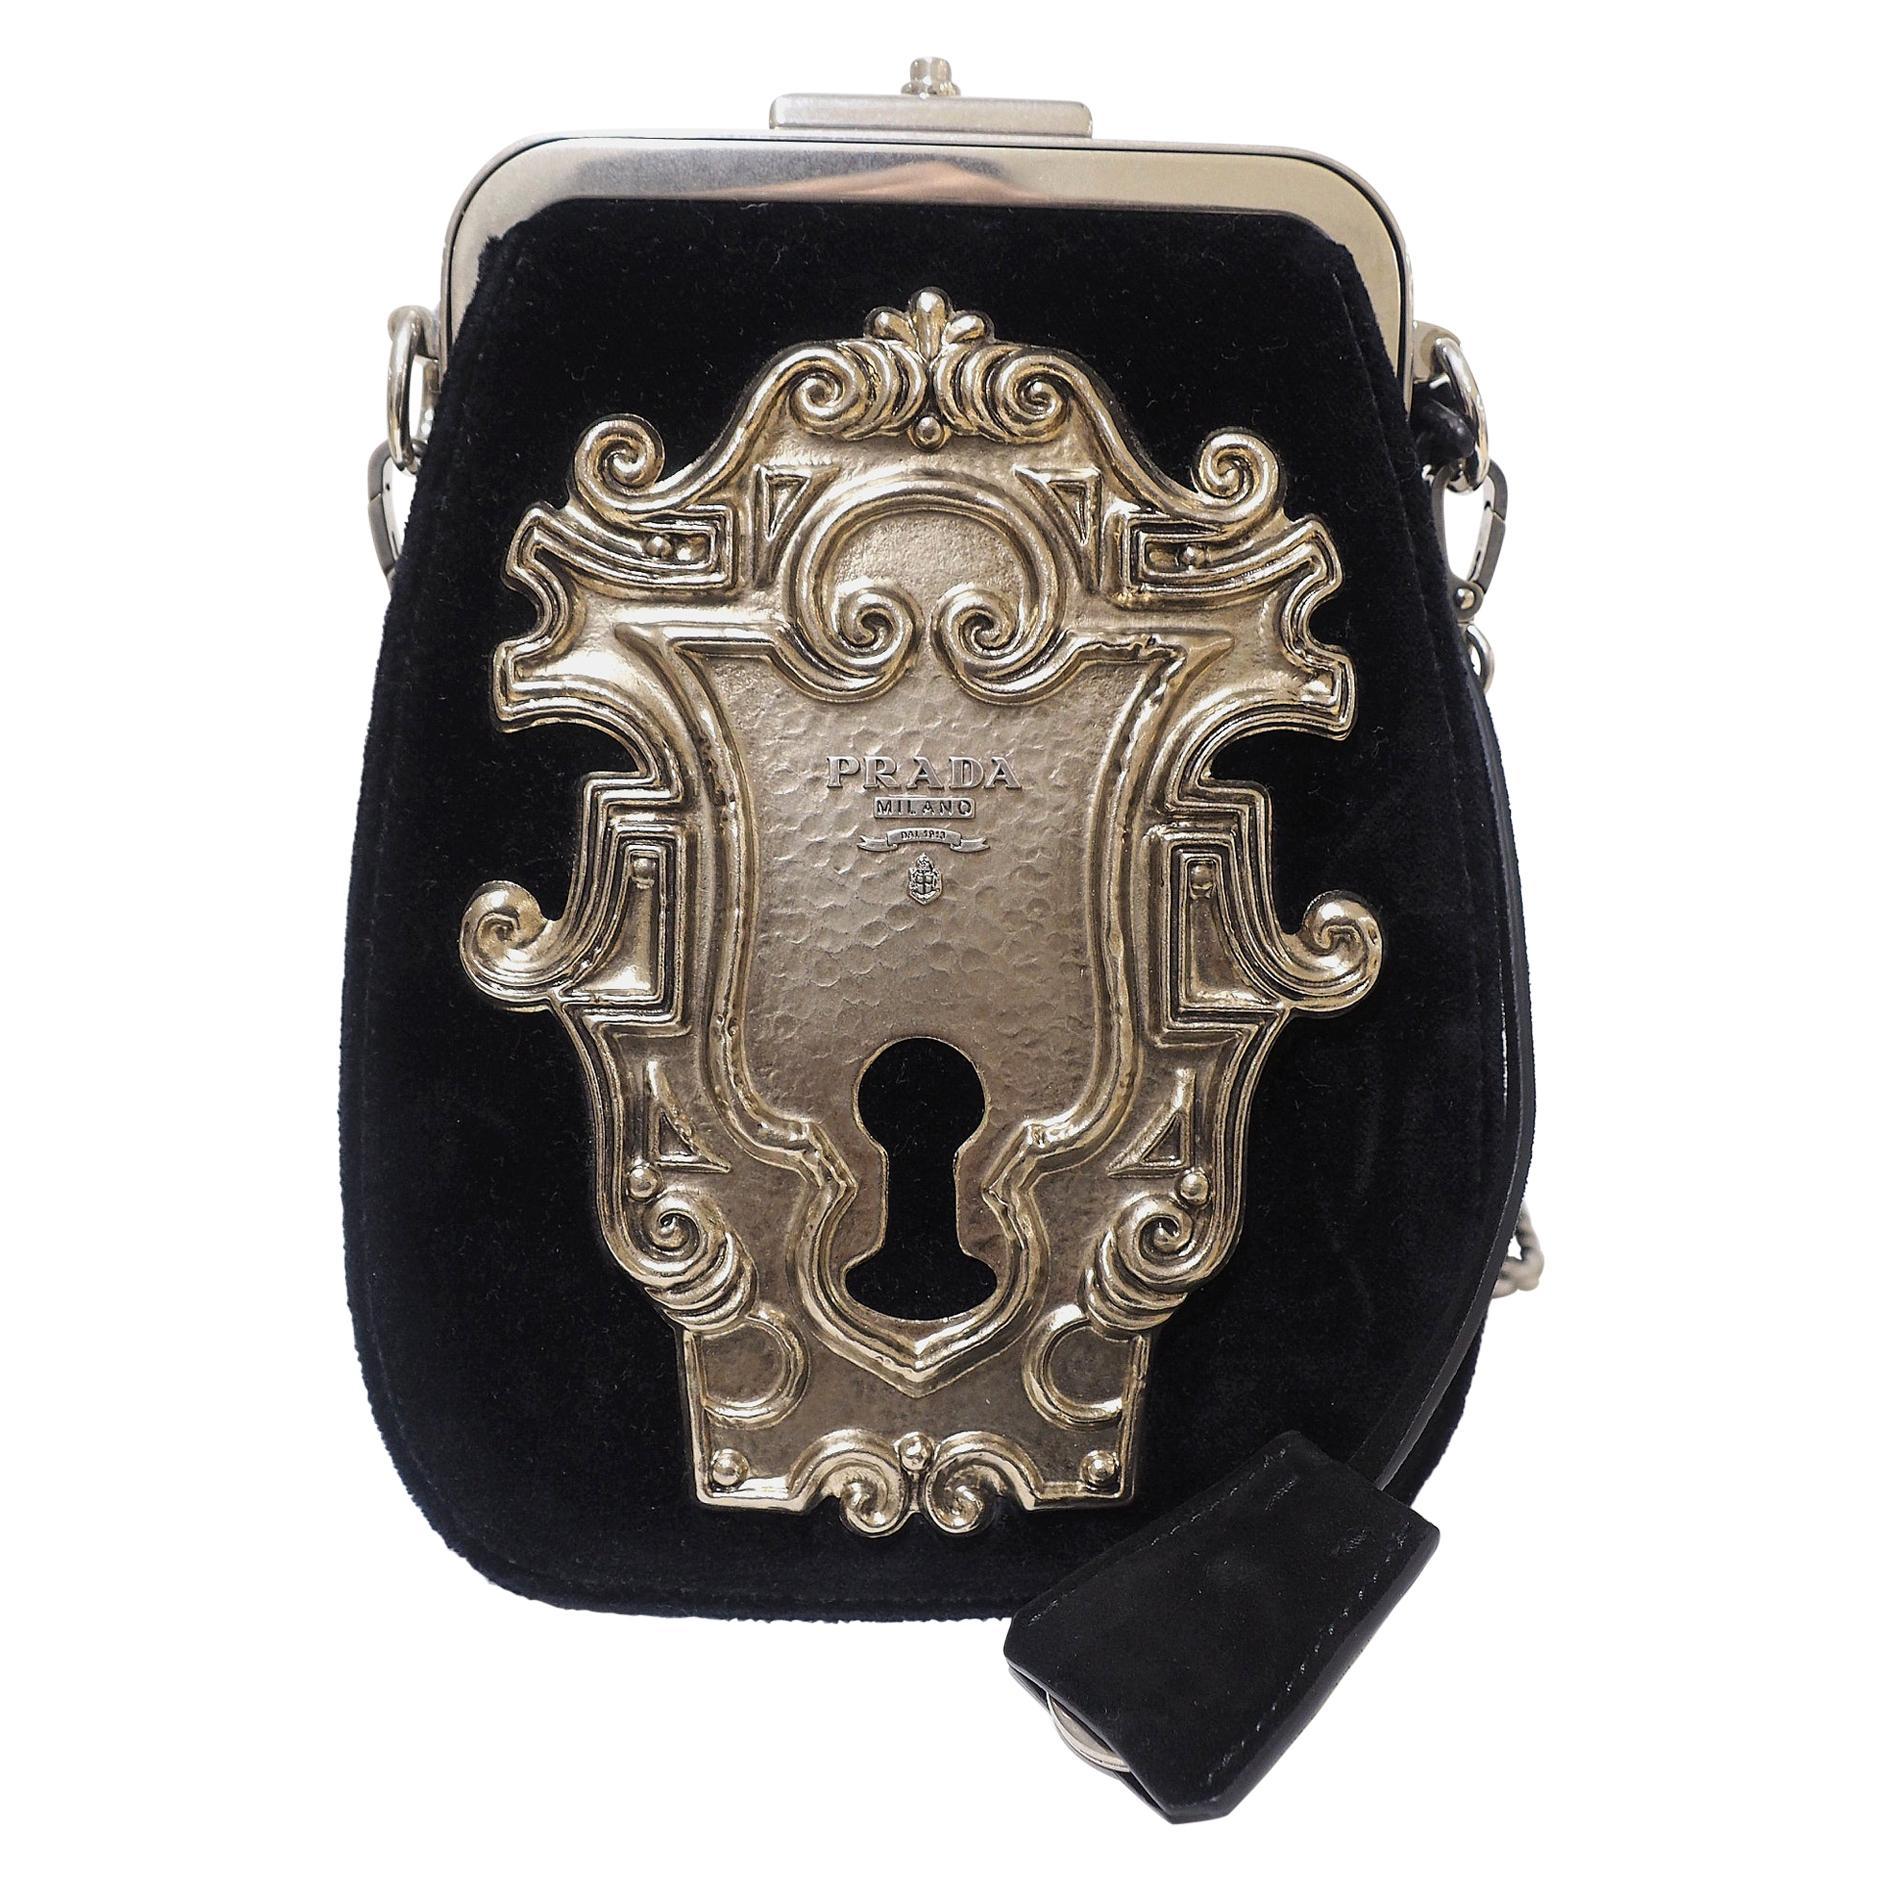 Prada Catwalk velvet lock purse NWOT